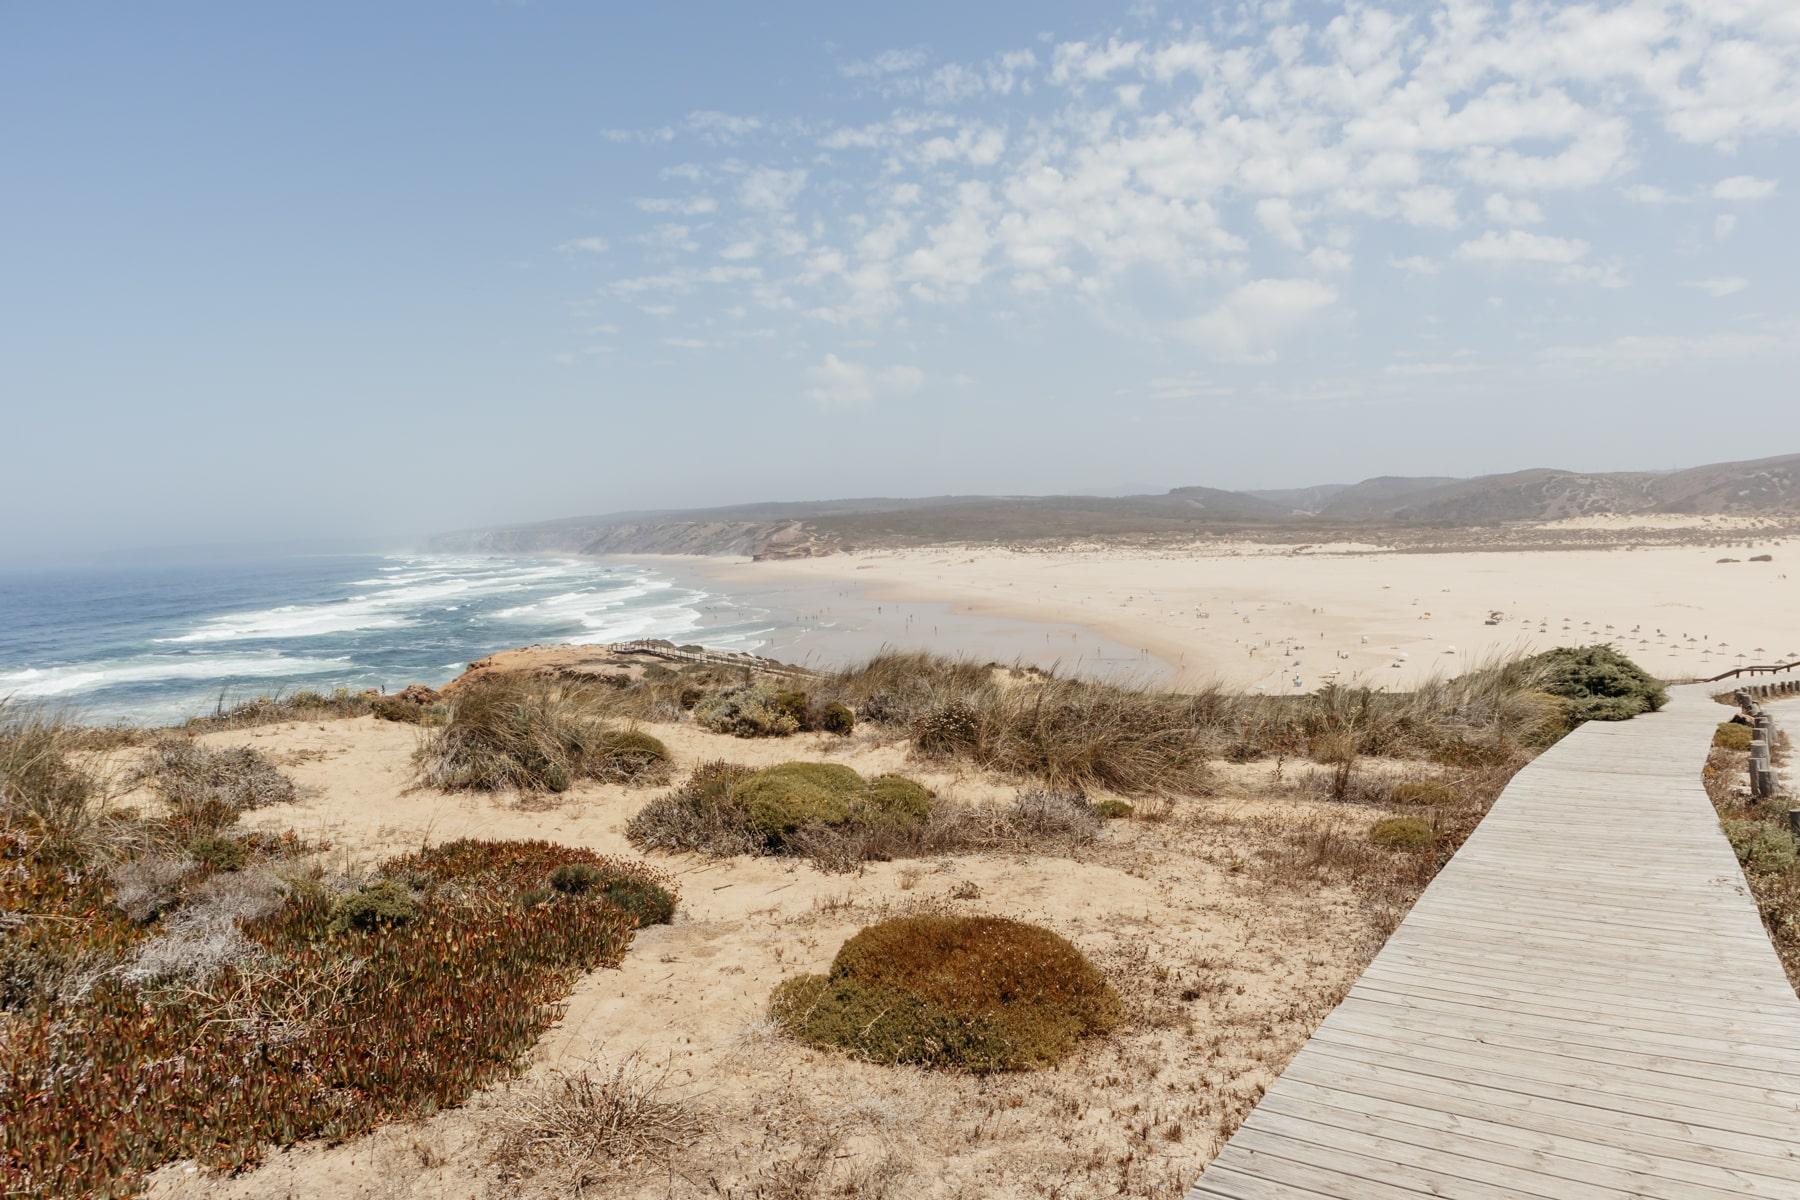 Wild Camping Portugal - Road Trip Route & Tipps für die Algarve